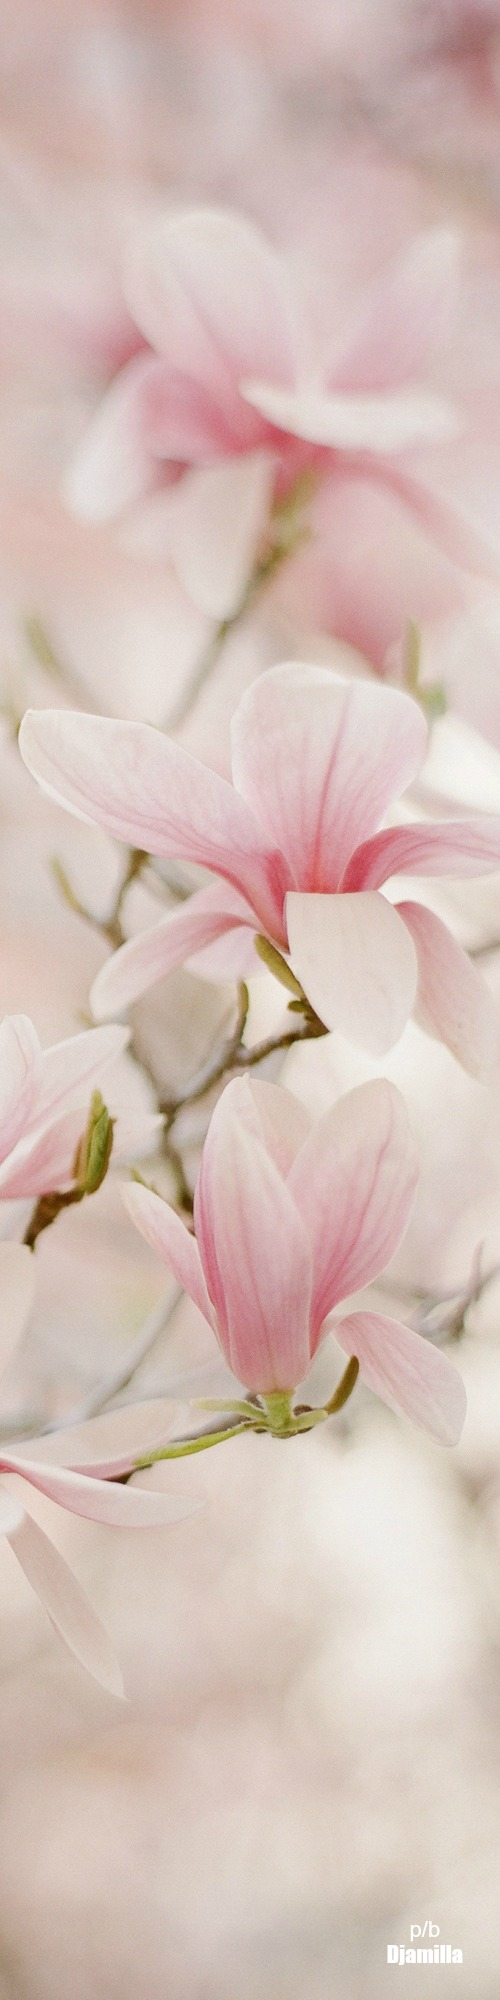 Springtime Whispers Cottage Flowers Beautiful Flowers Magnolia Trees